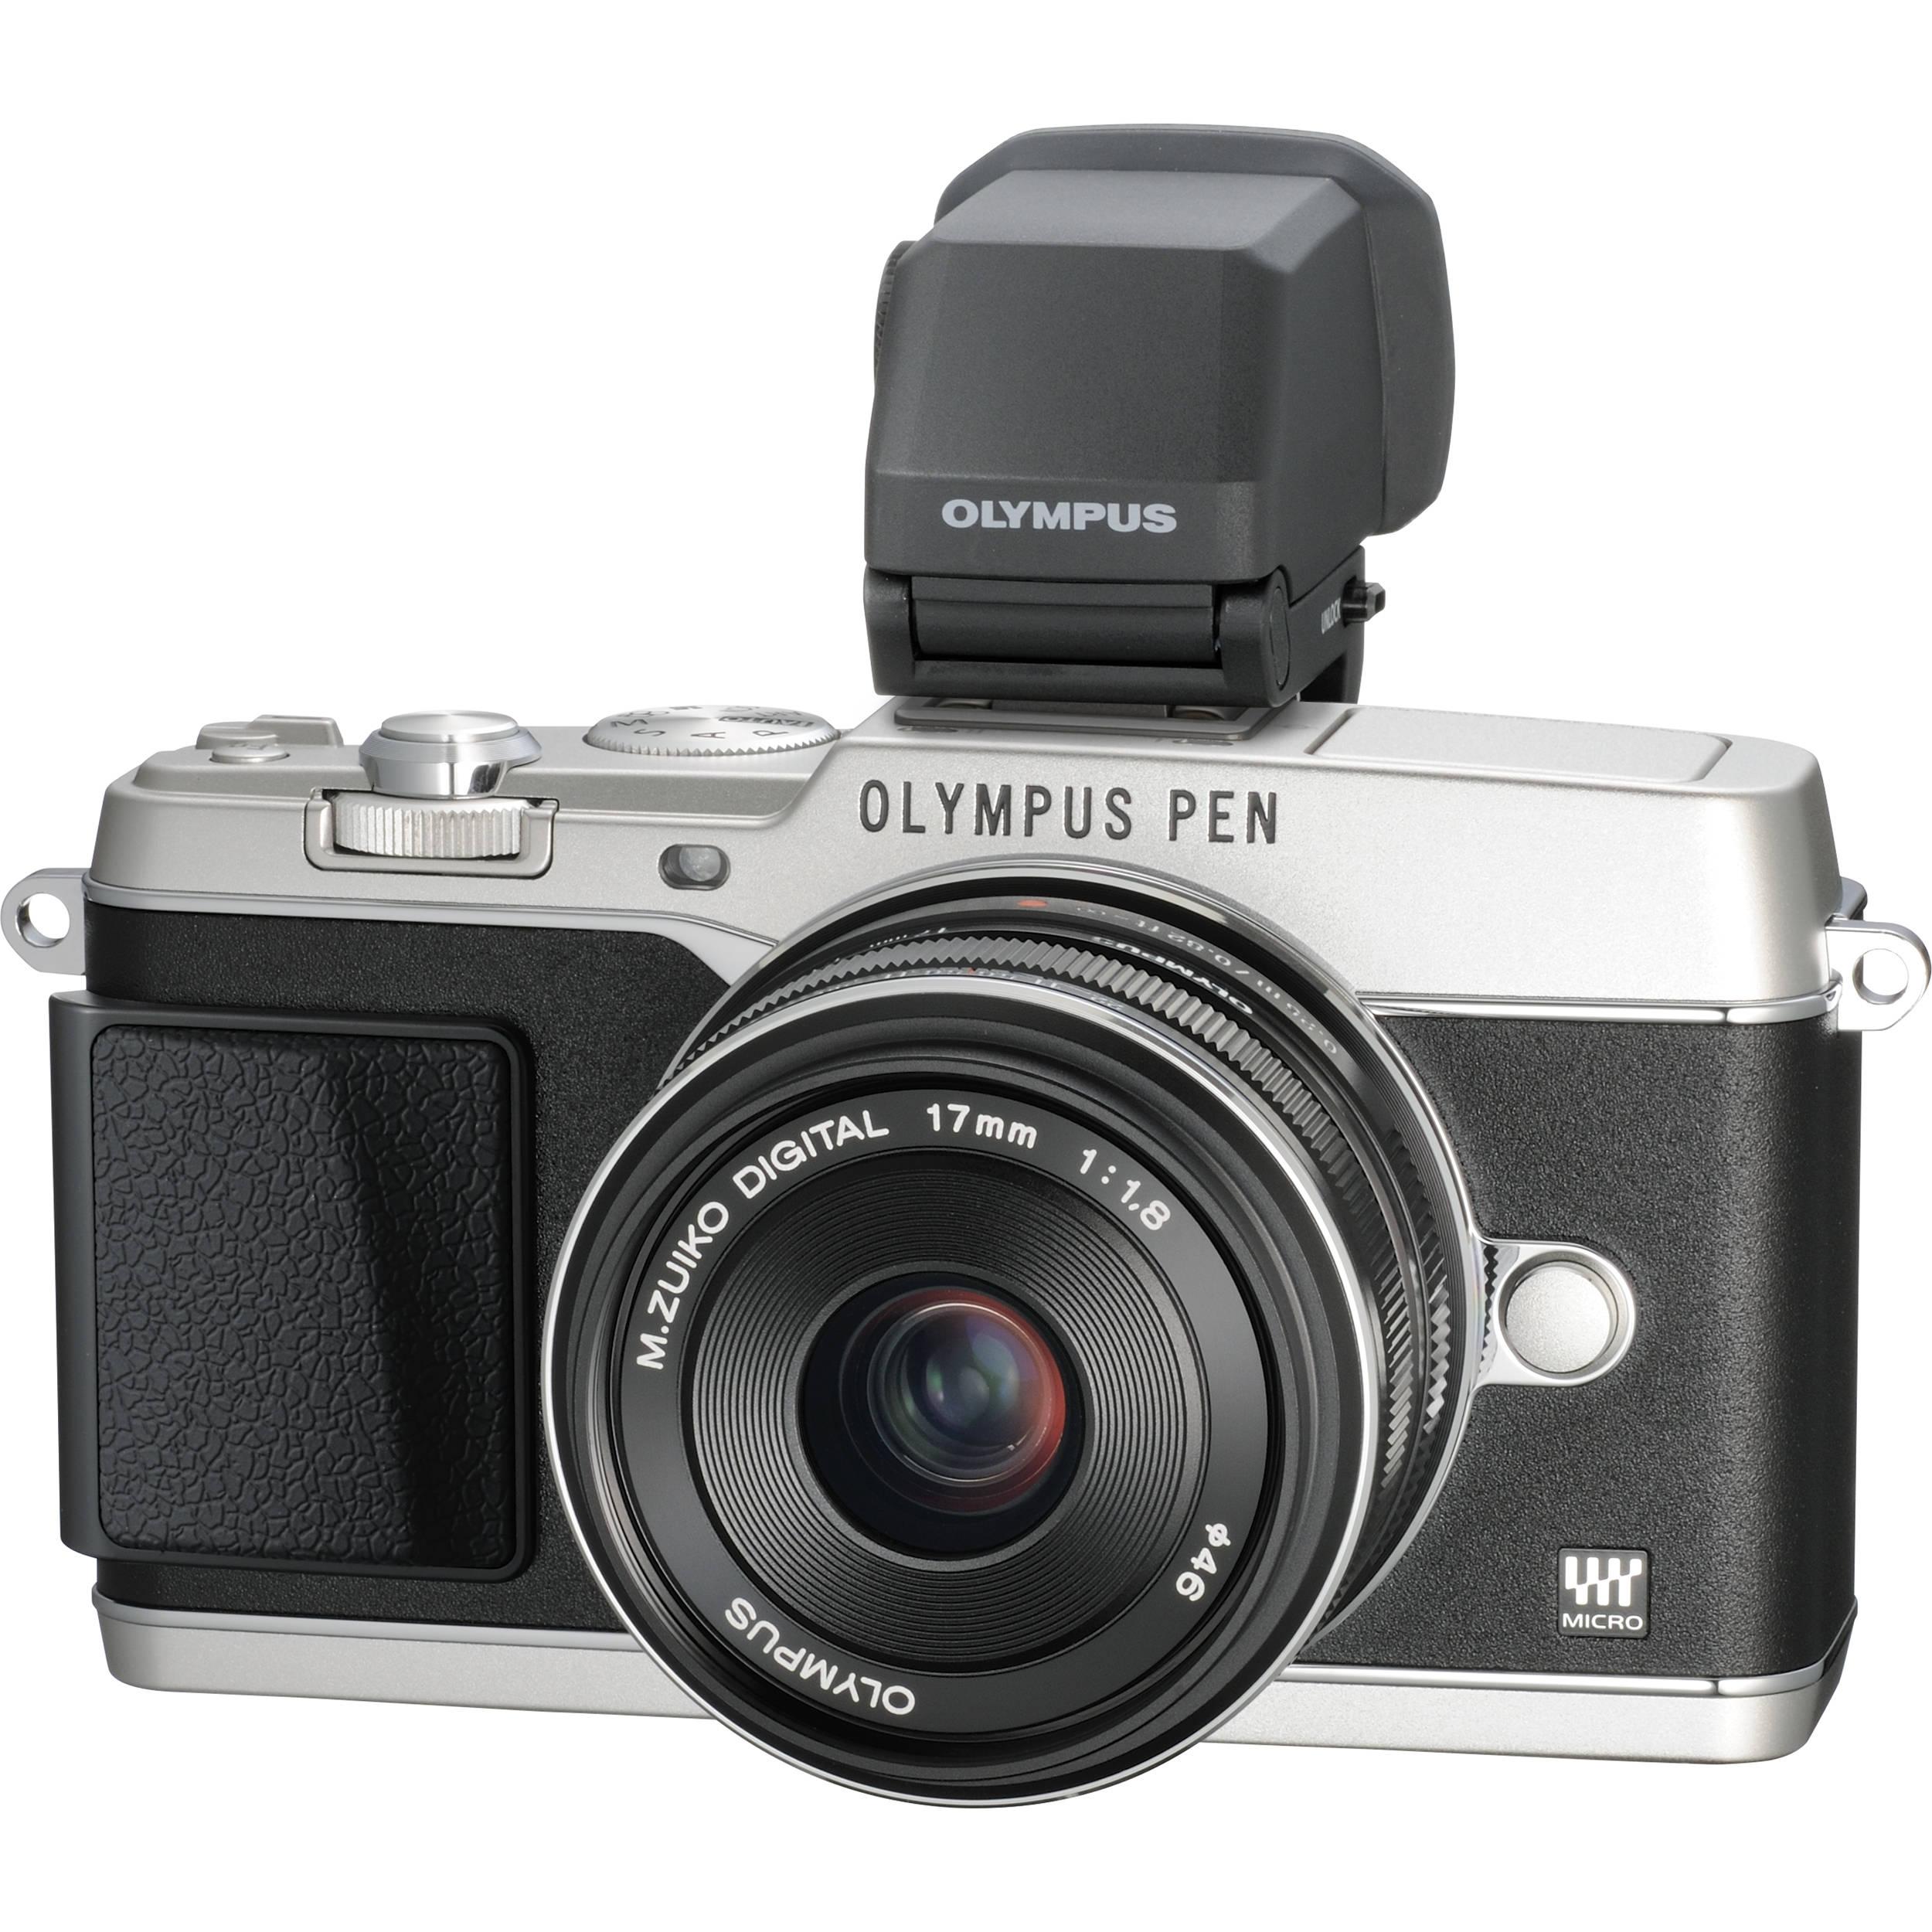 Olympus Digital Camera: Olympus PEN E-P5 Mirrorless Micro Four Thirds V204053SU000 B&H